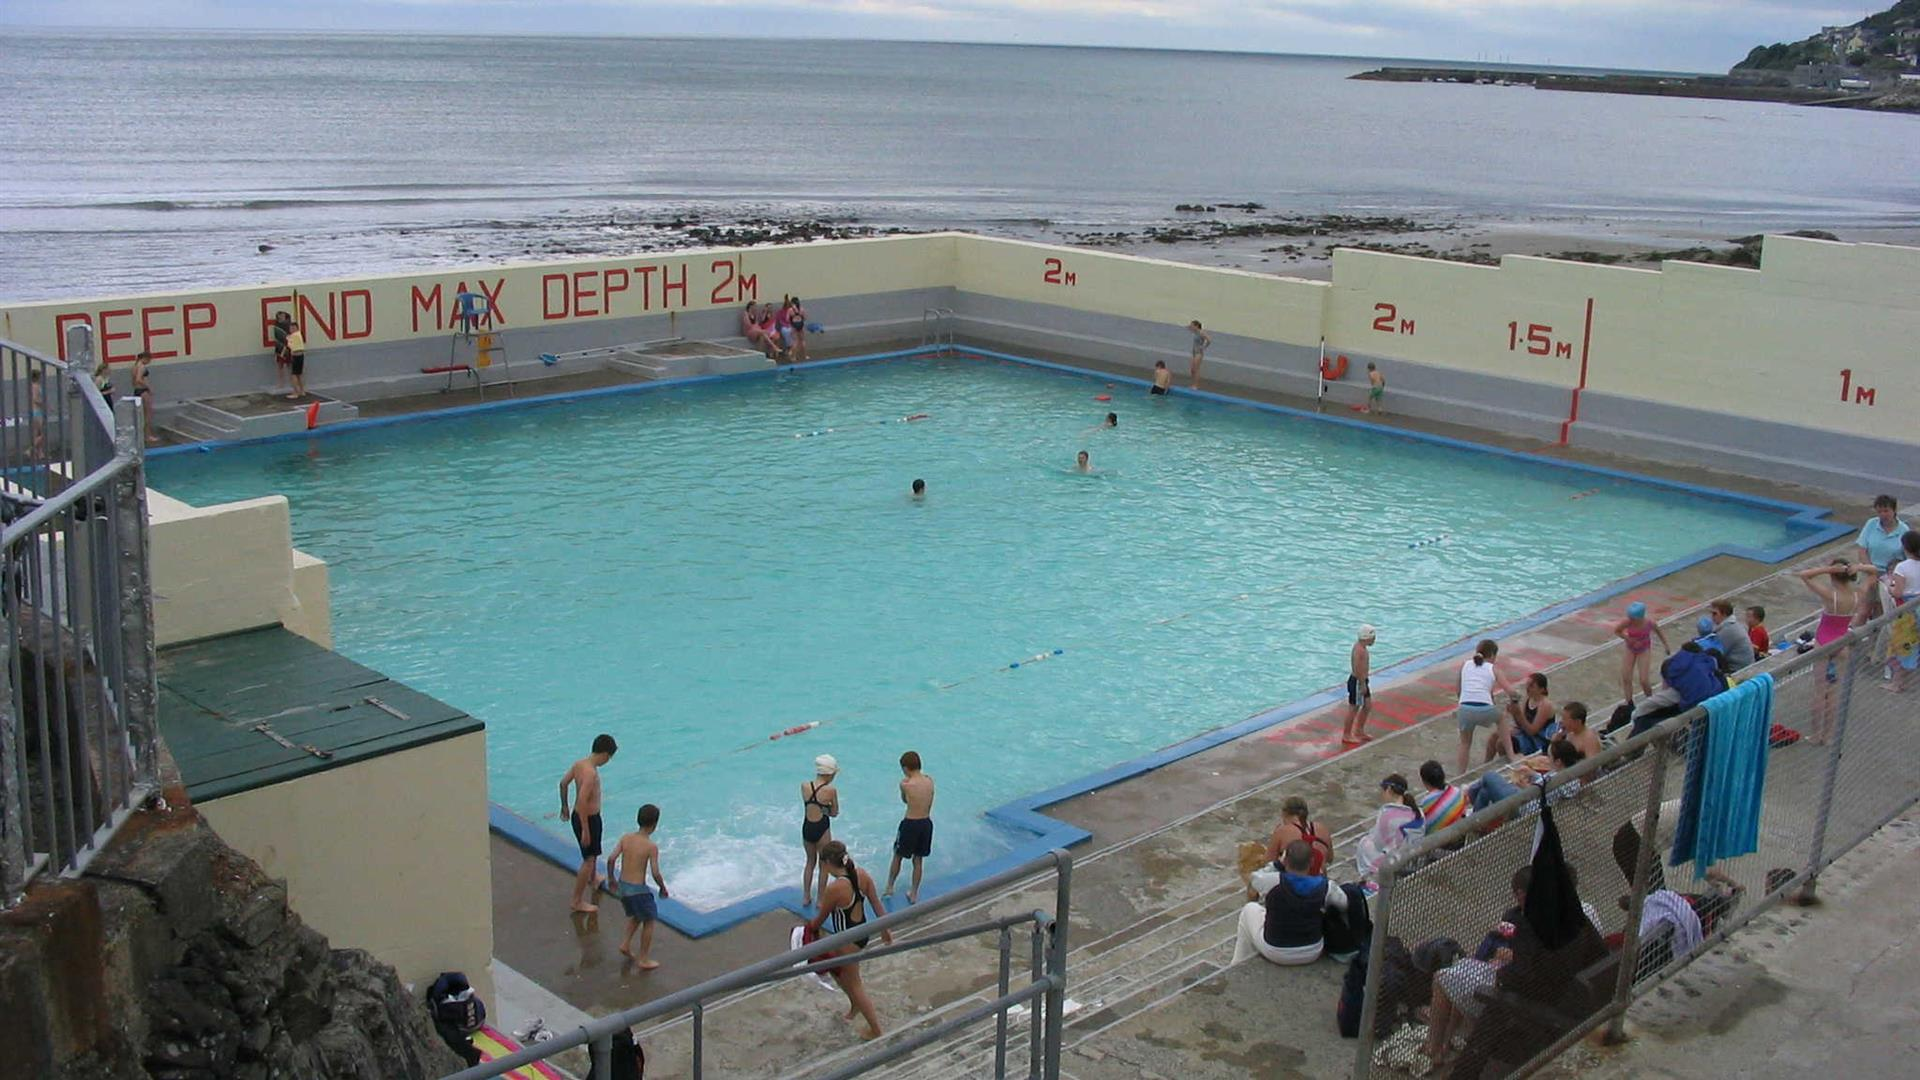 Newcastle Rock Pool